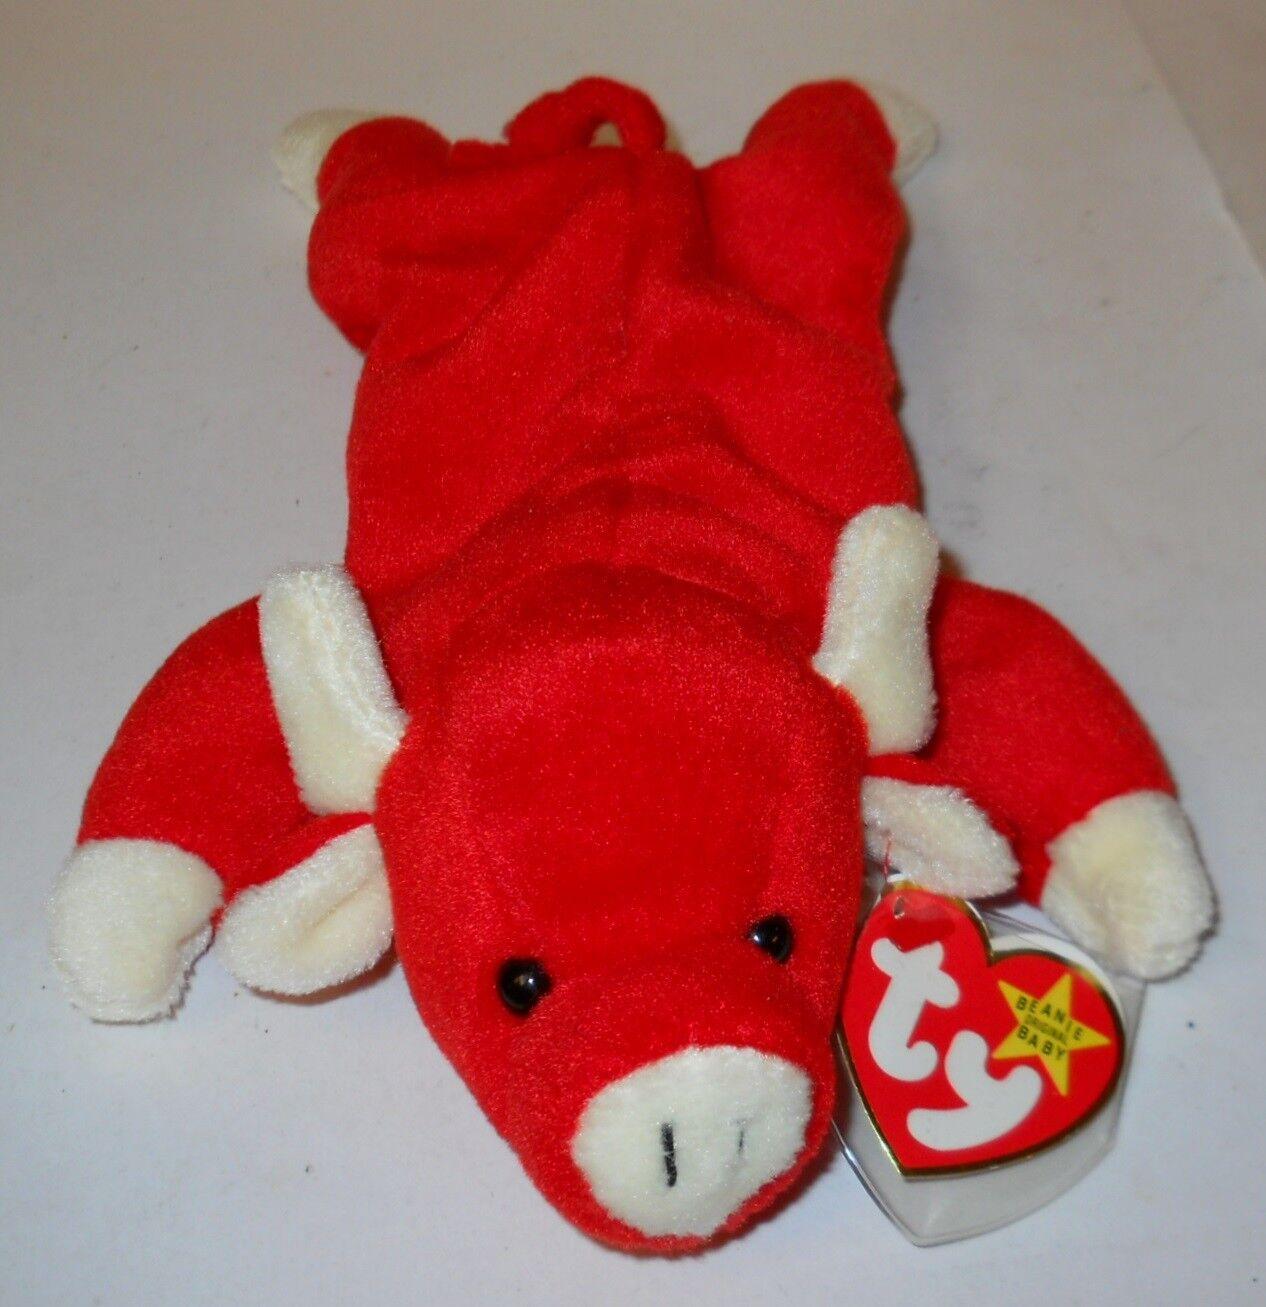 TY BEANIE BEANIE BEANIE BABY 9  SNORT THE RED BULL W TAG ERRORS, STYLE 4002  1995  CLEAN  2be7a7